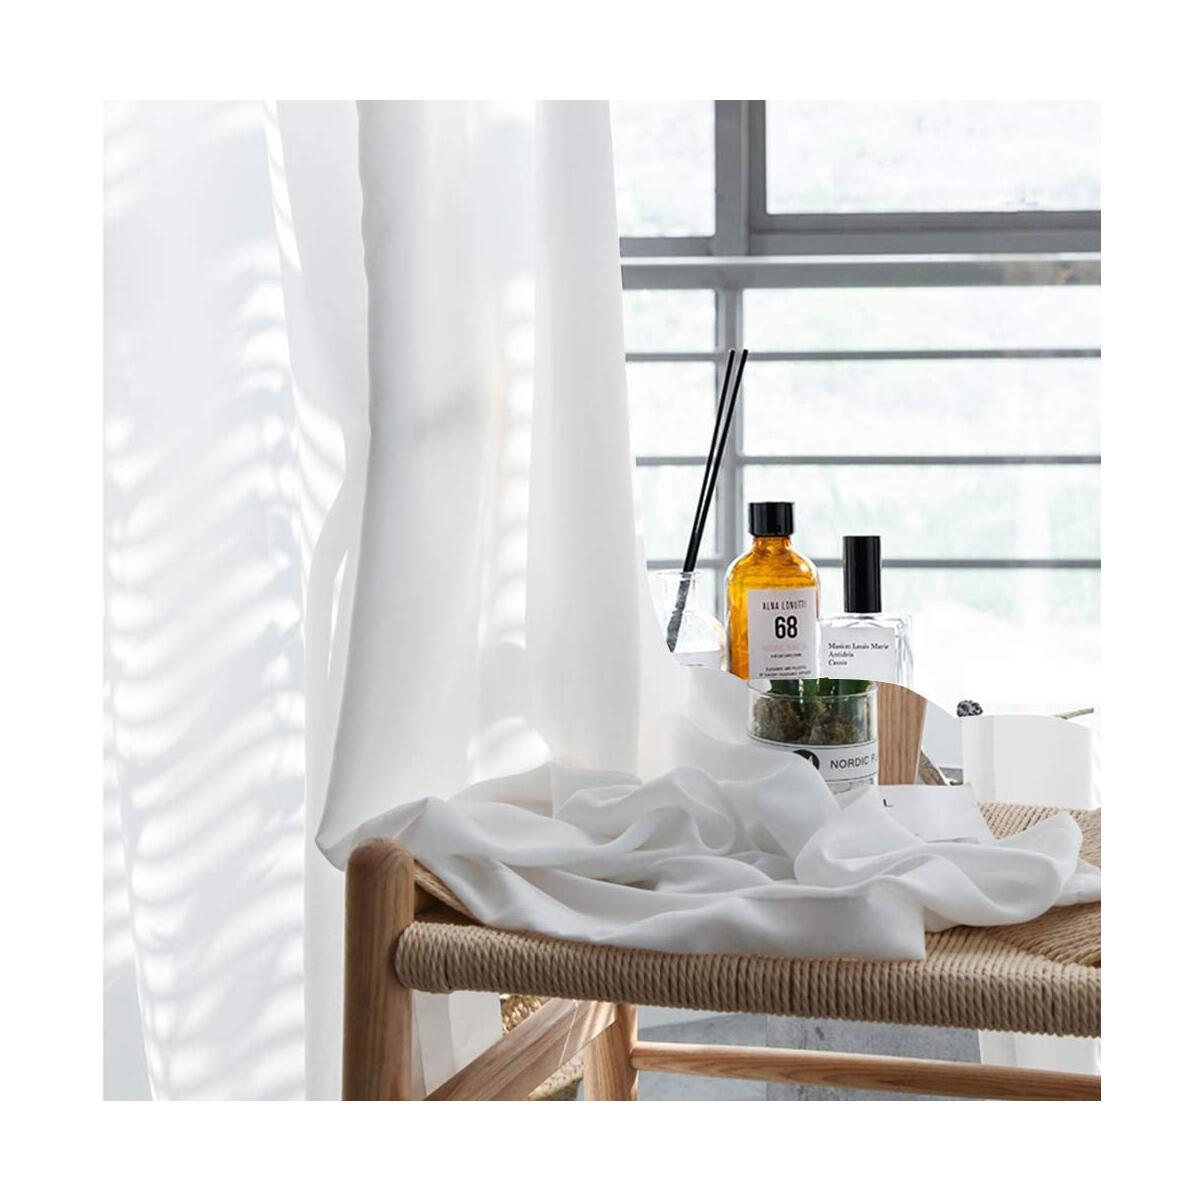 Kawcono White Semi Sheer Curtains 96